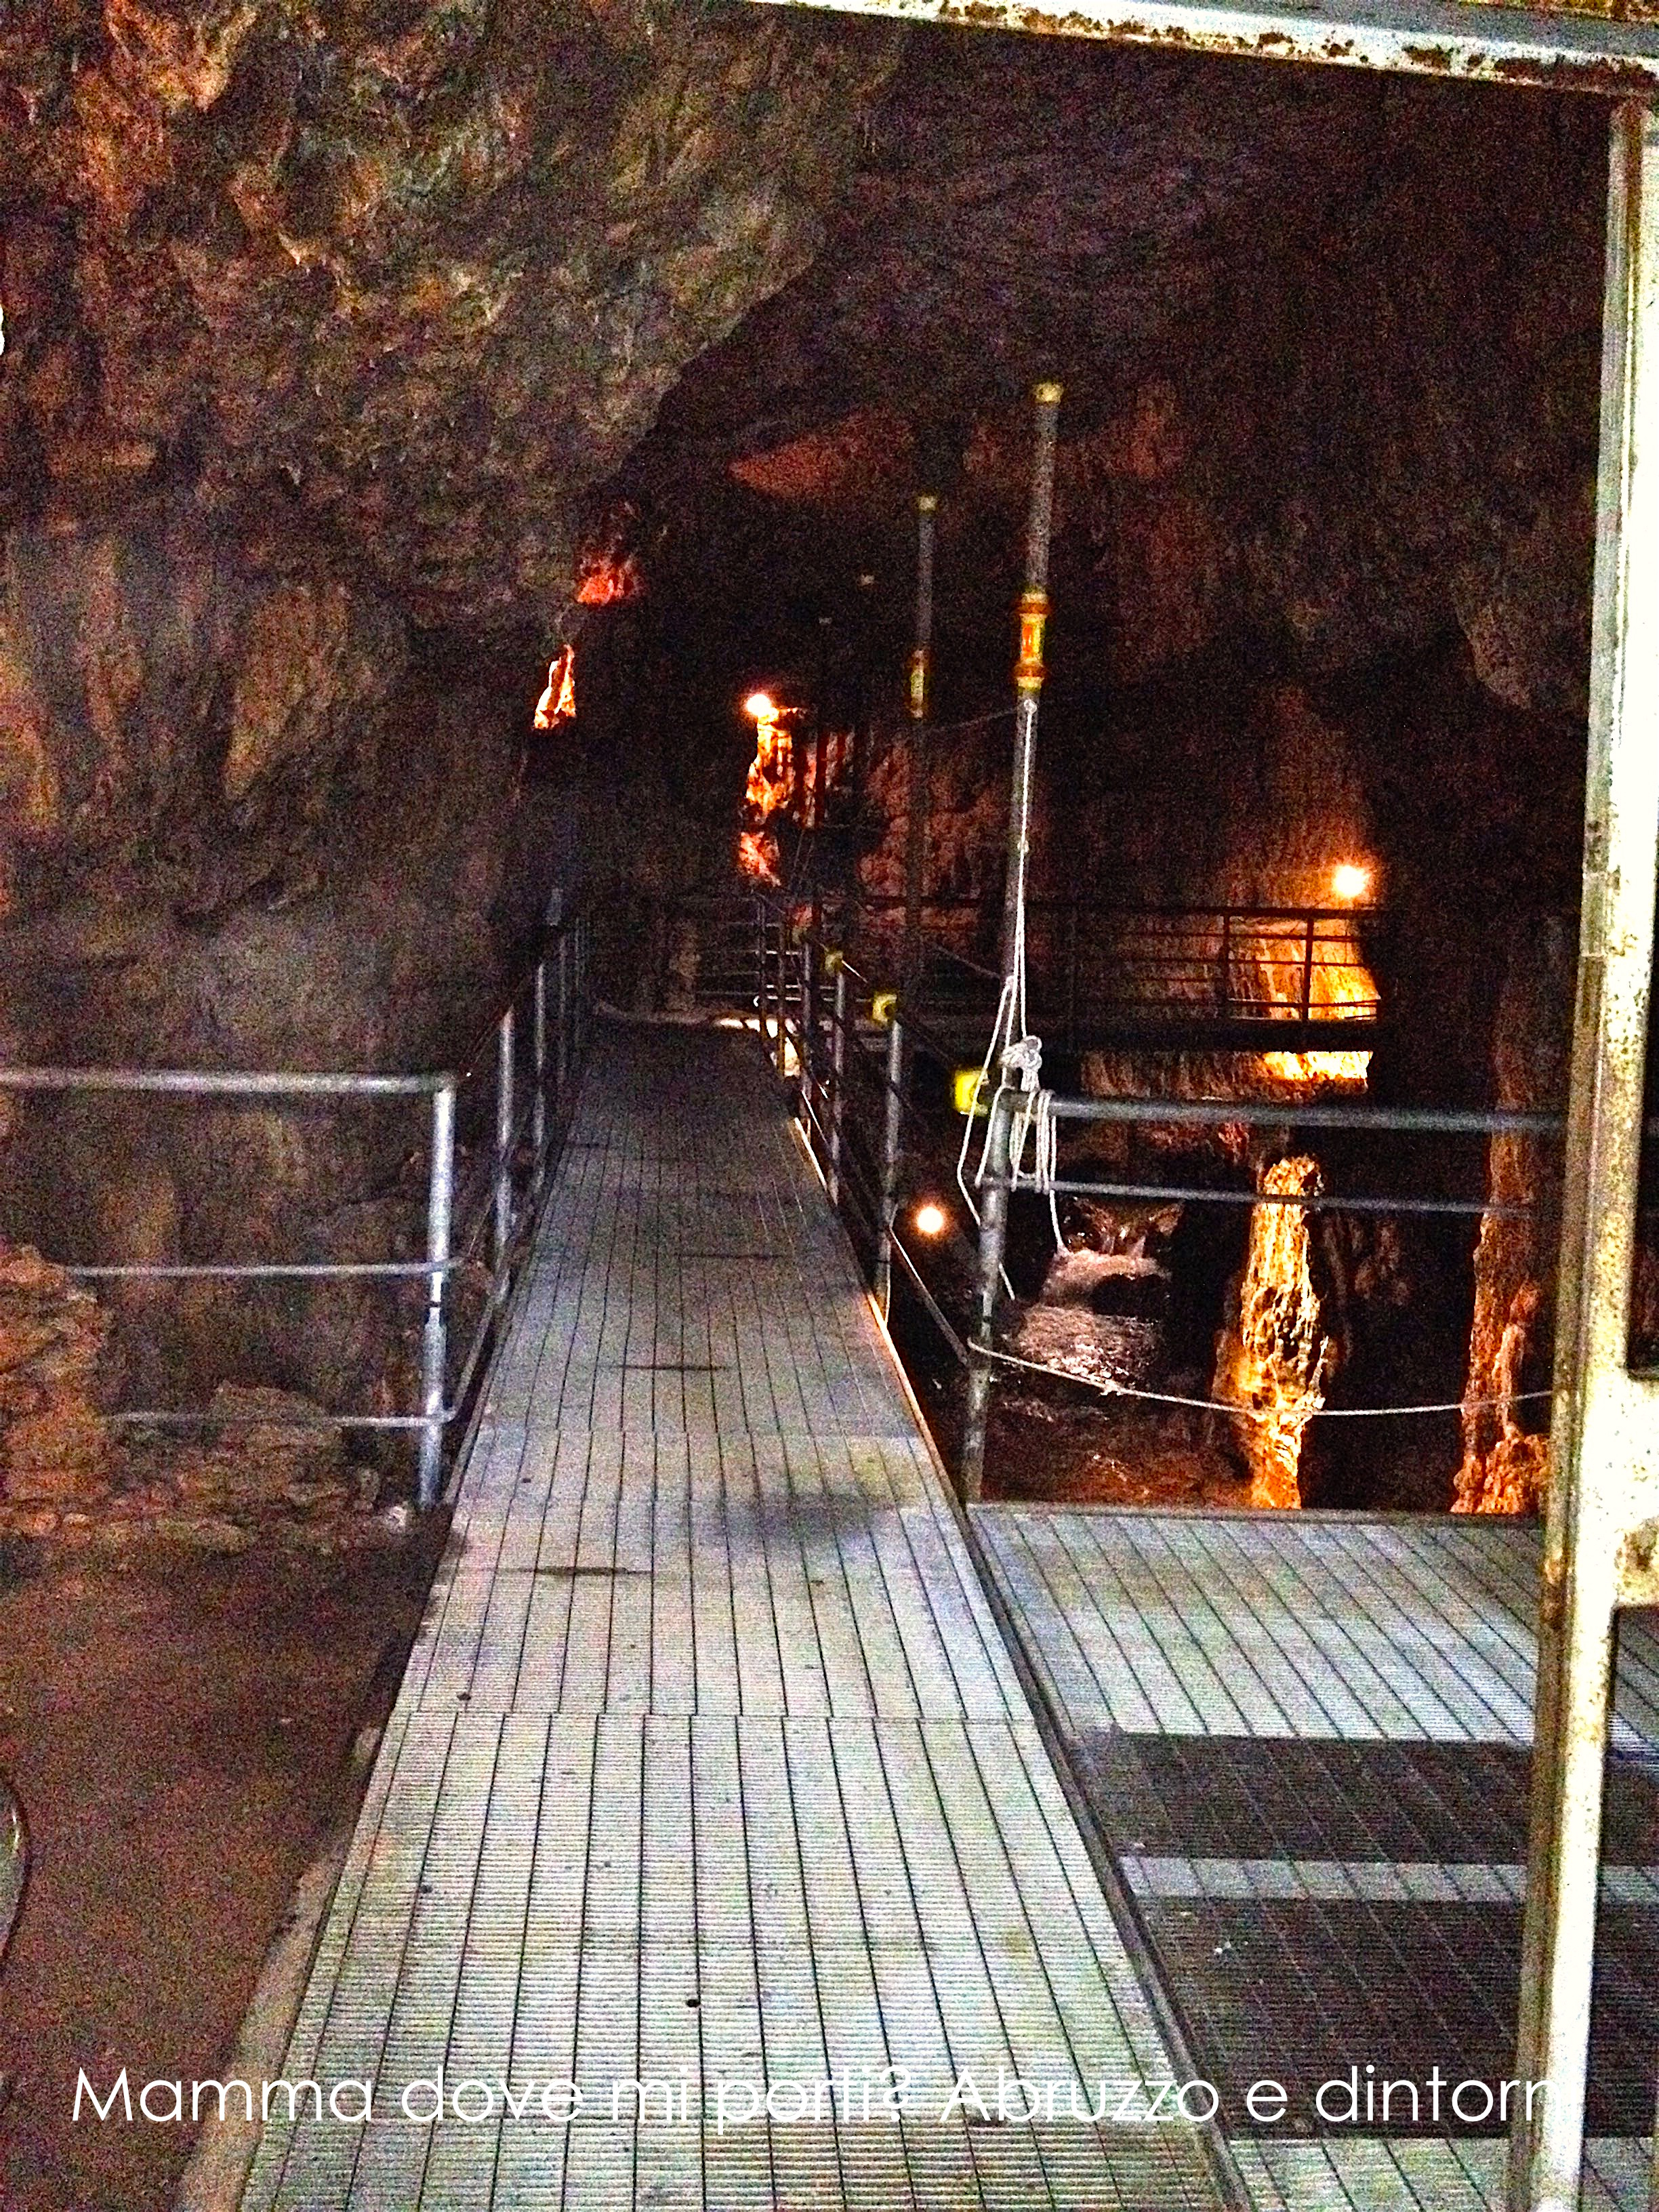 Grotte di Stiffe - Ingresso - San Demetrio ne' Vestini (AQ)